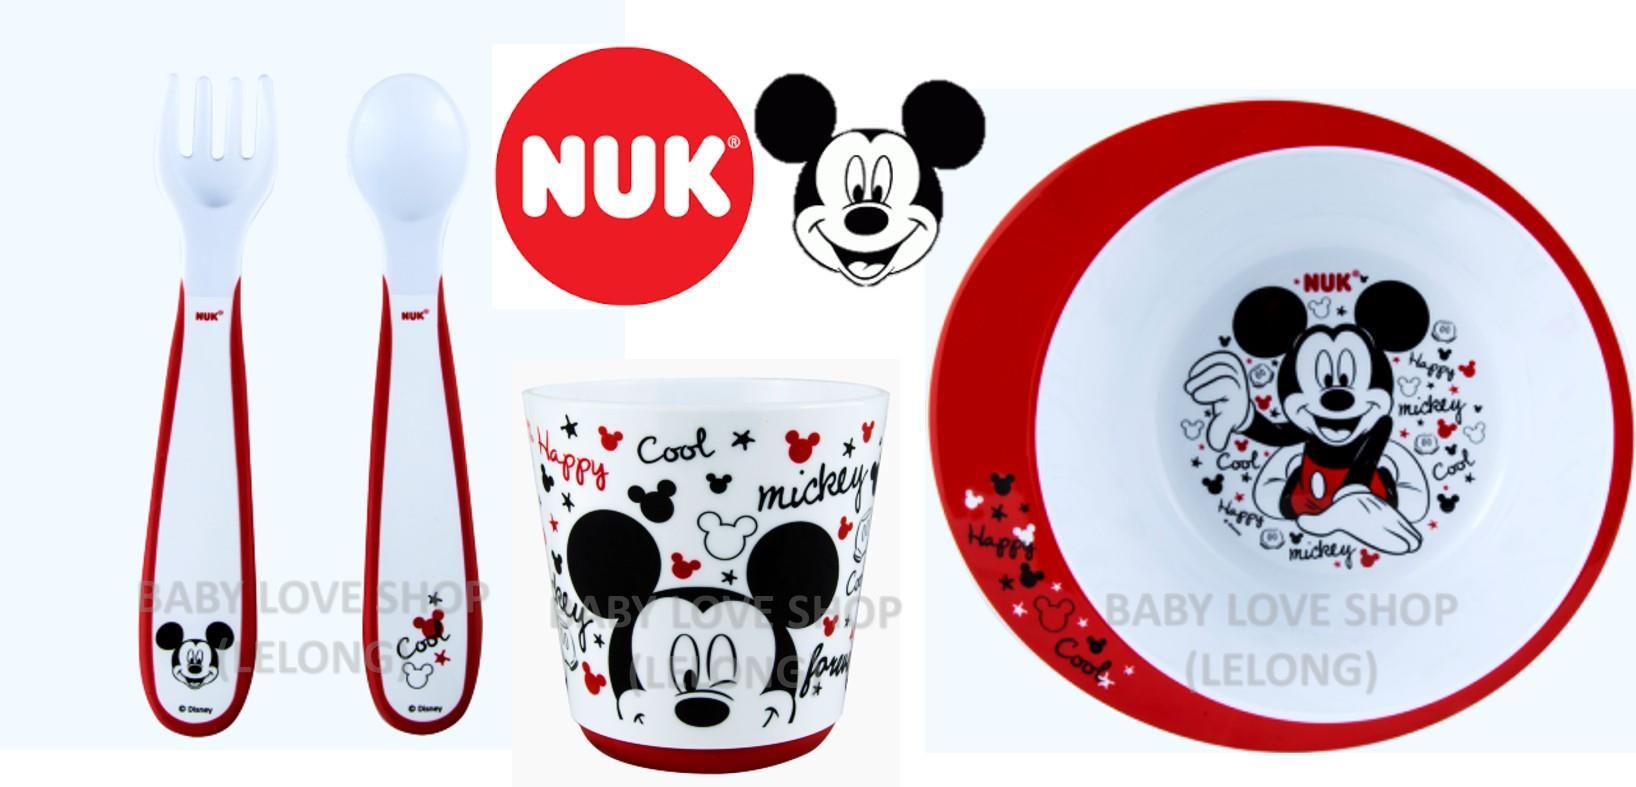 NUK Mickey Mouse 4pcs Tableware Set & NUK Mickey Mouse 4pcs Tableware Set (end 7/22/2018 10:41 AM)